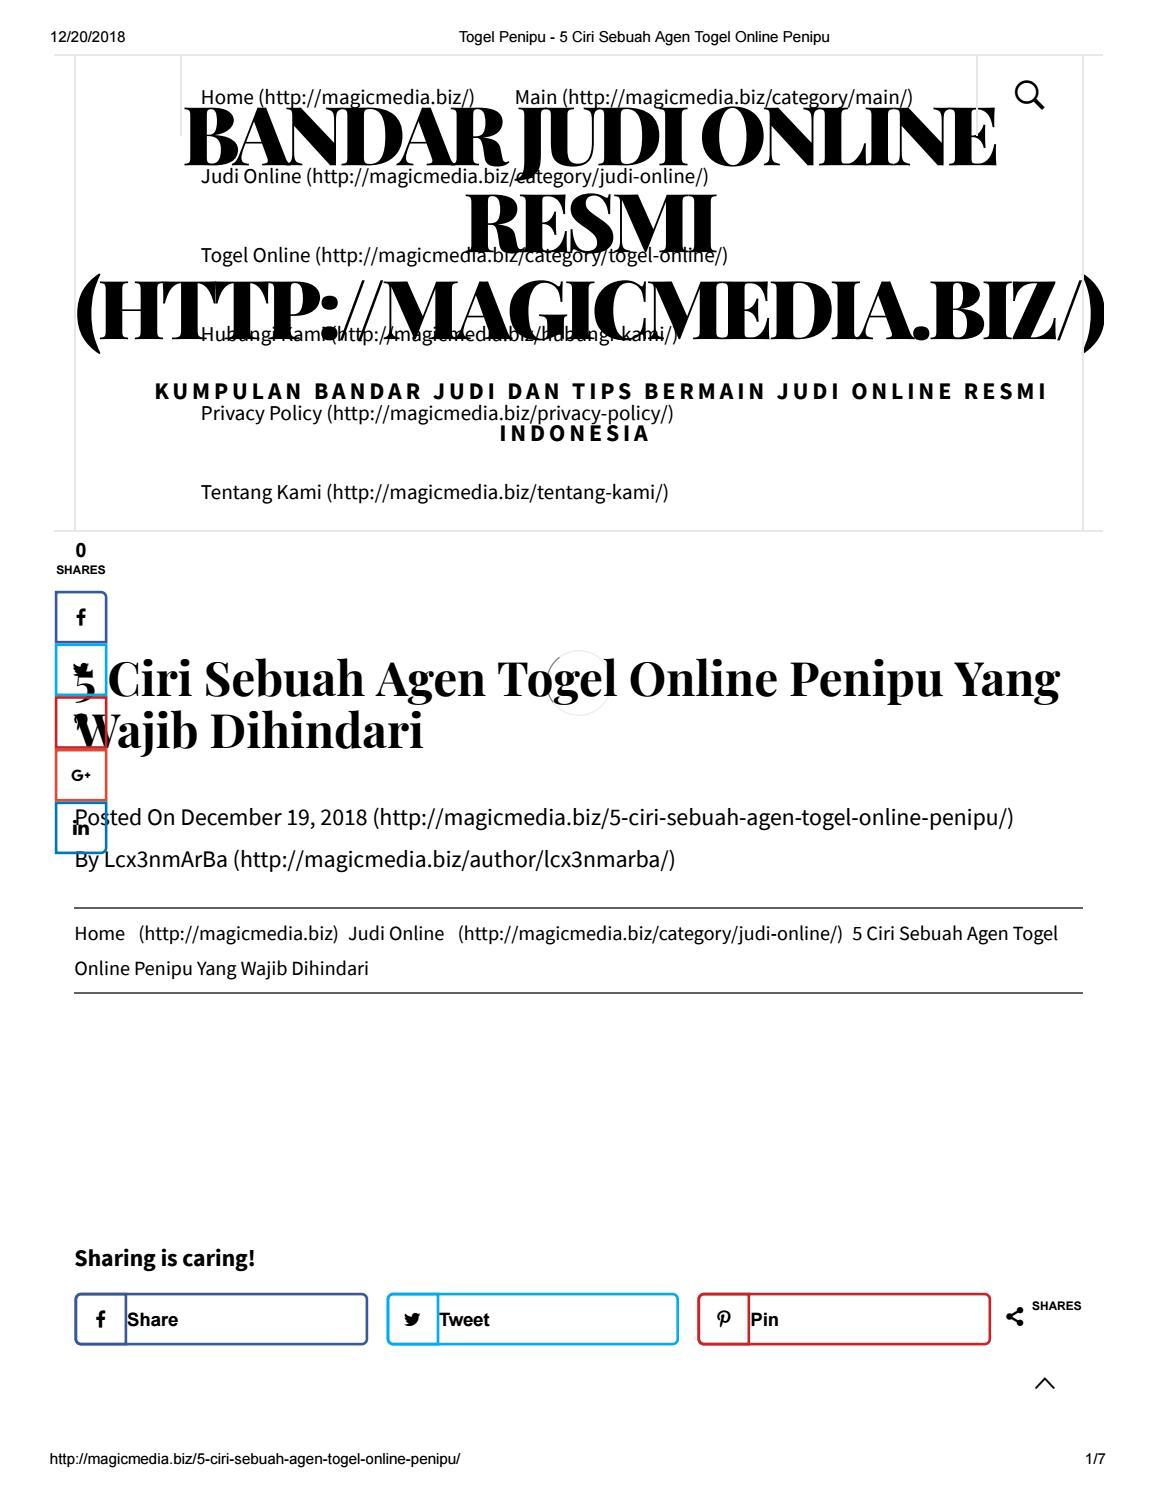 5 Ciri Sebuah Agen Togel Online Penipu Yang Wajib Dihindari By Bintangdomino Issuu